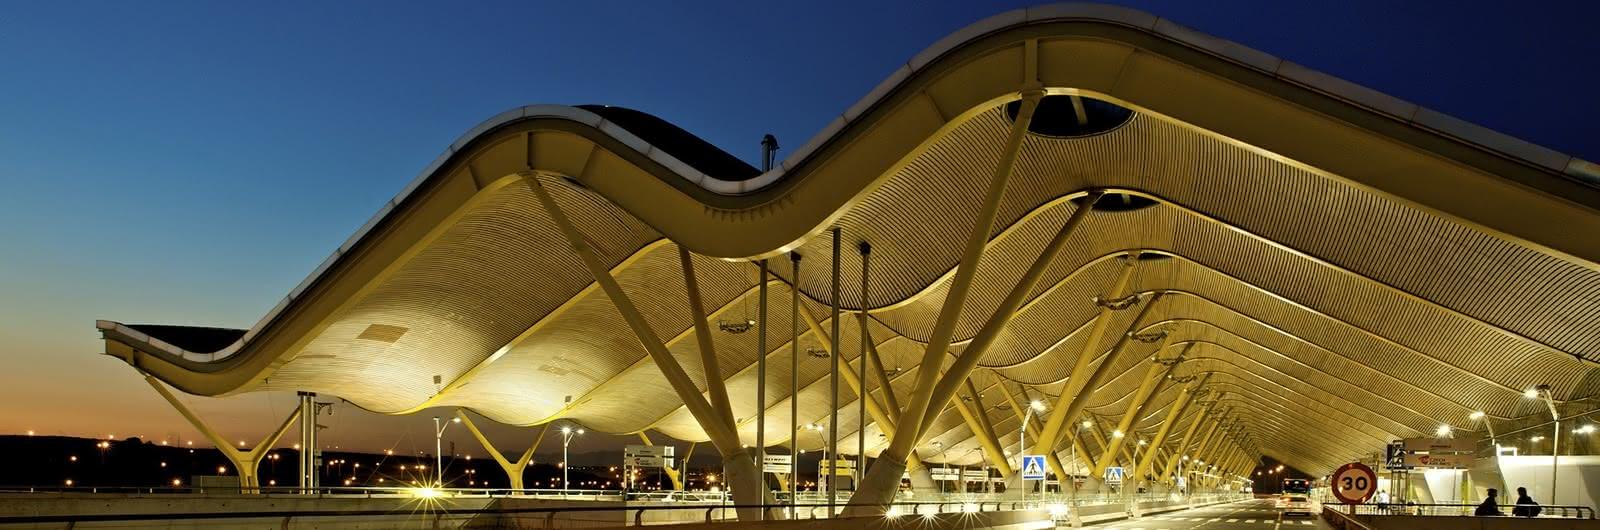 madrid airport header